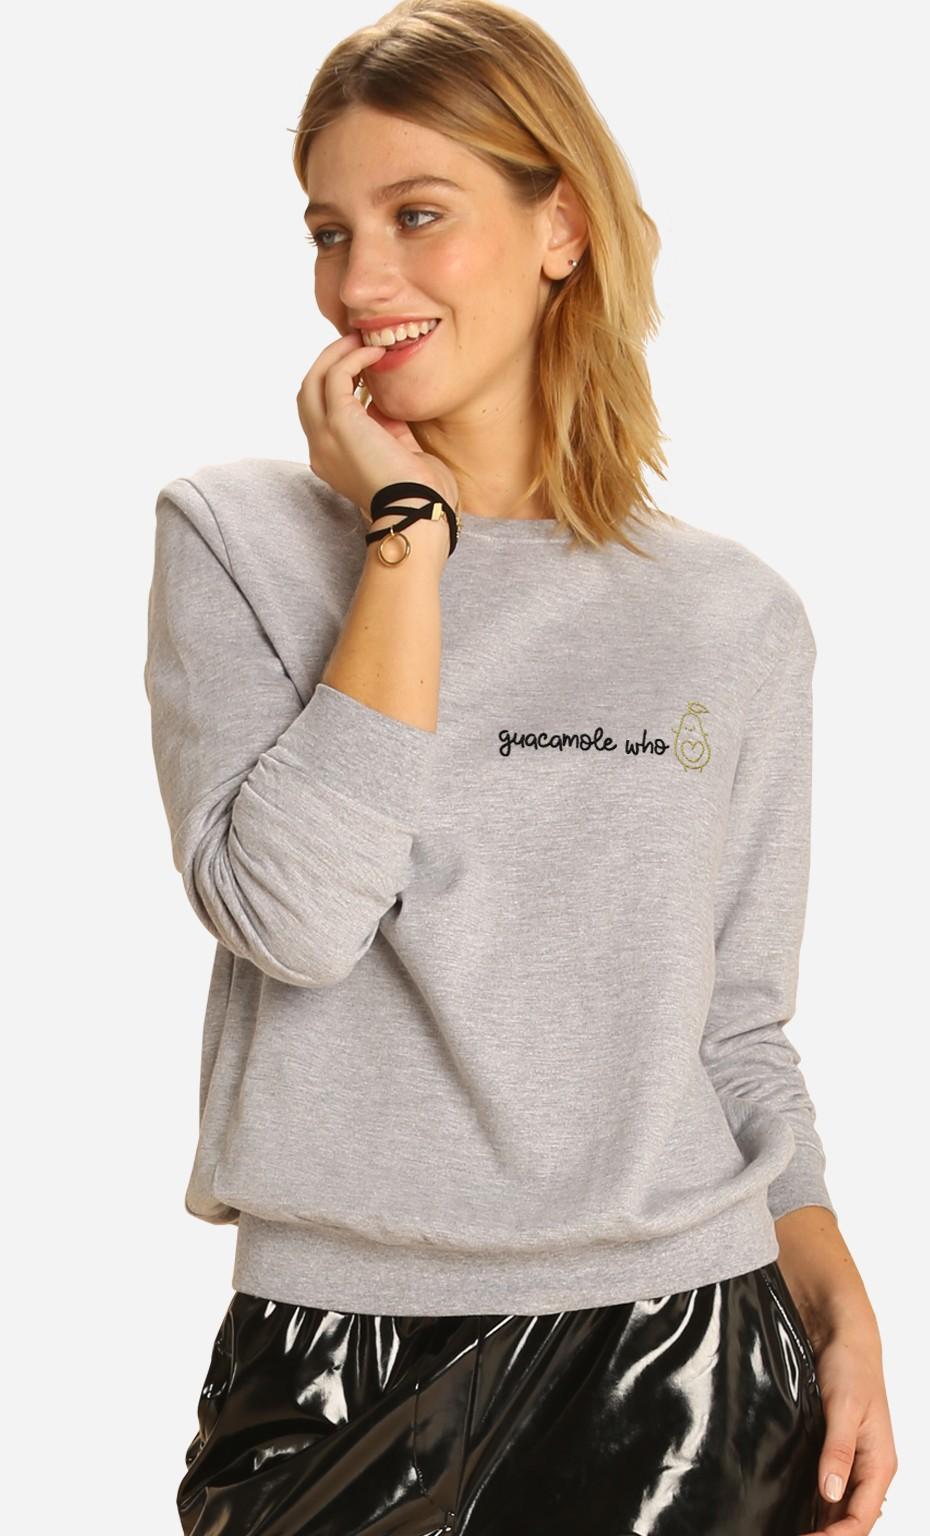 Sweatshirt Guacamole Who - Brodé